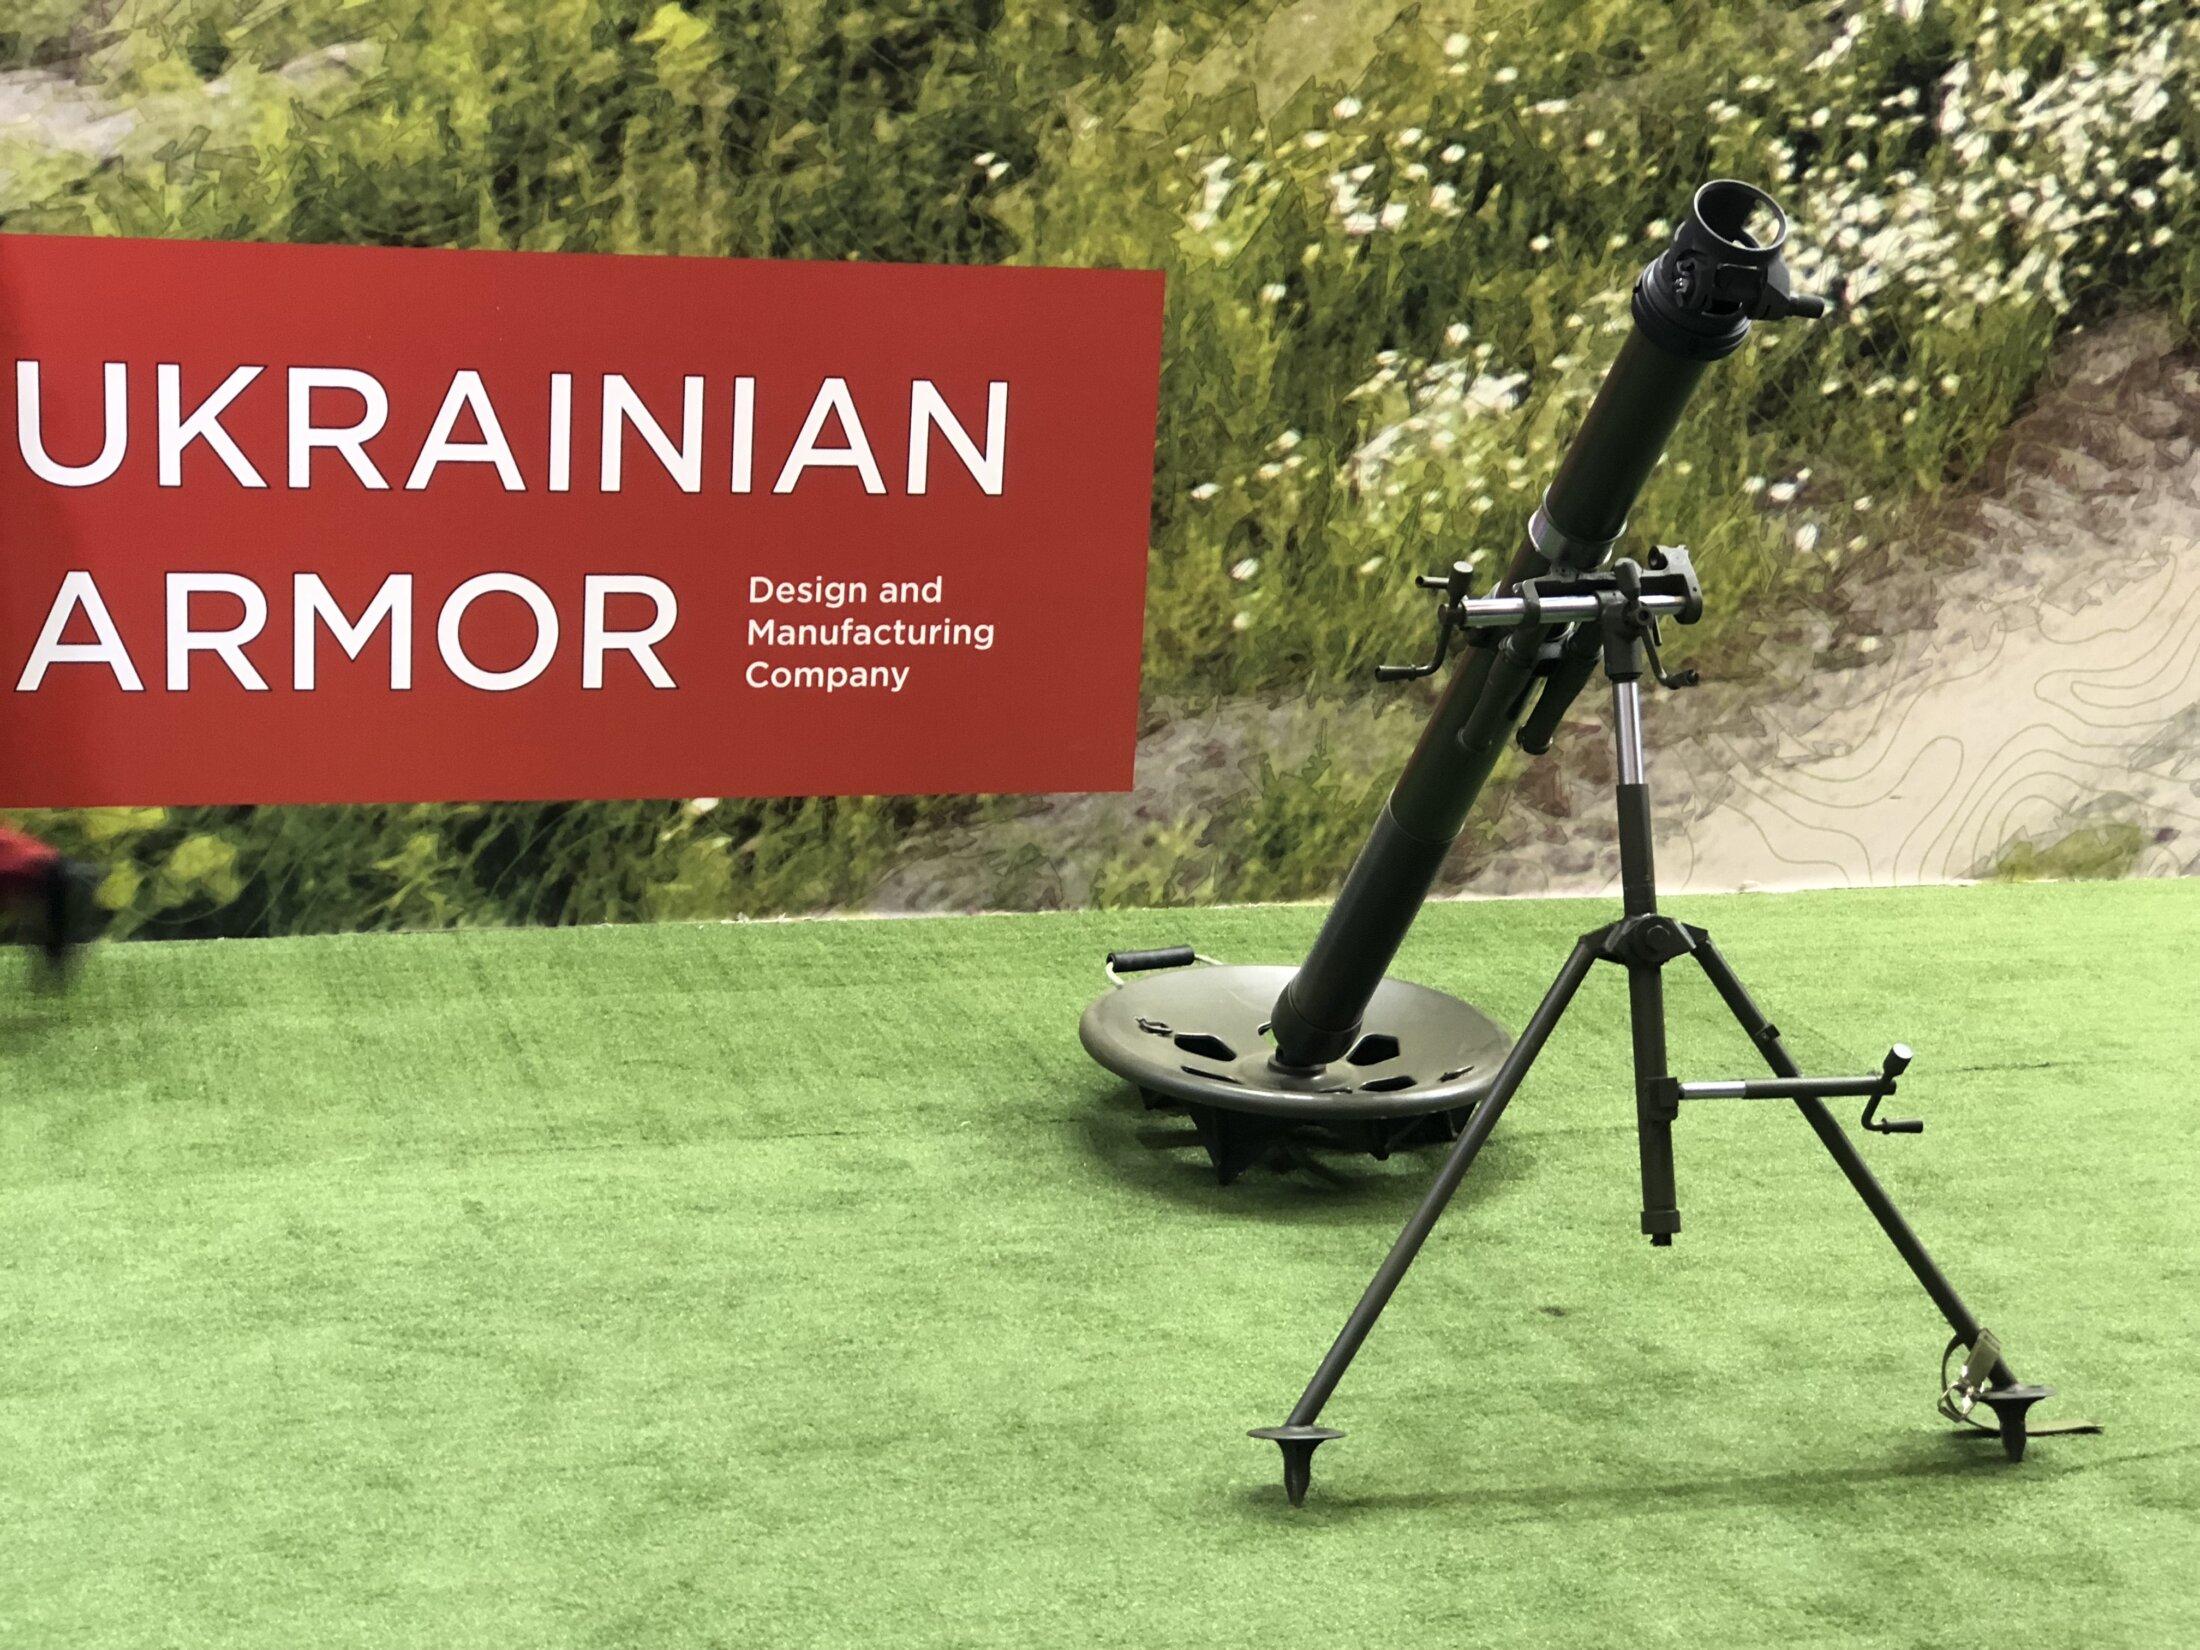 82 Mm Mortar Launcher